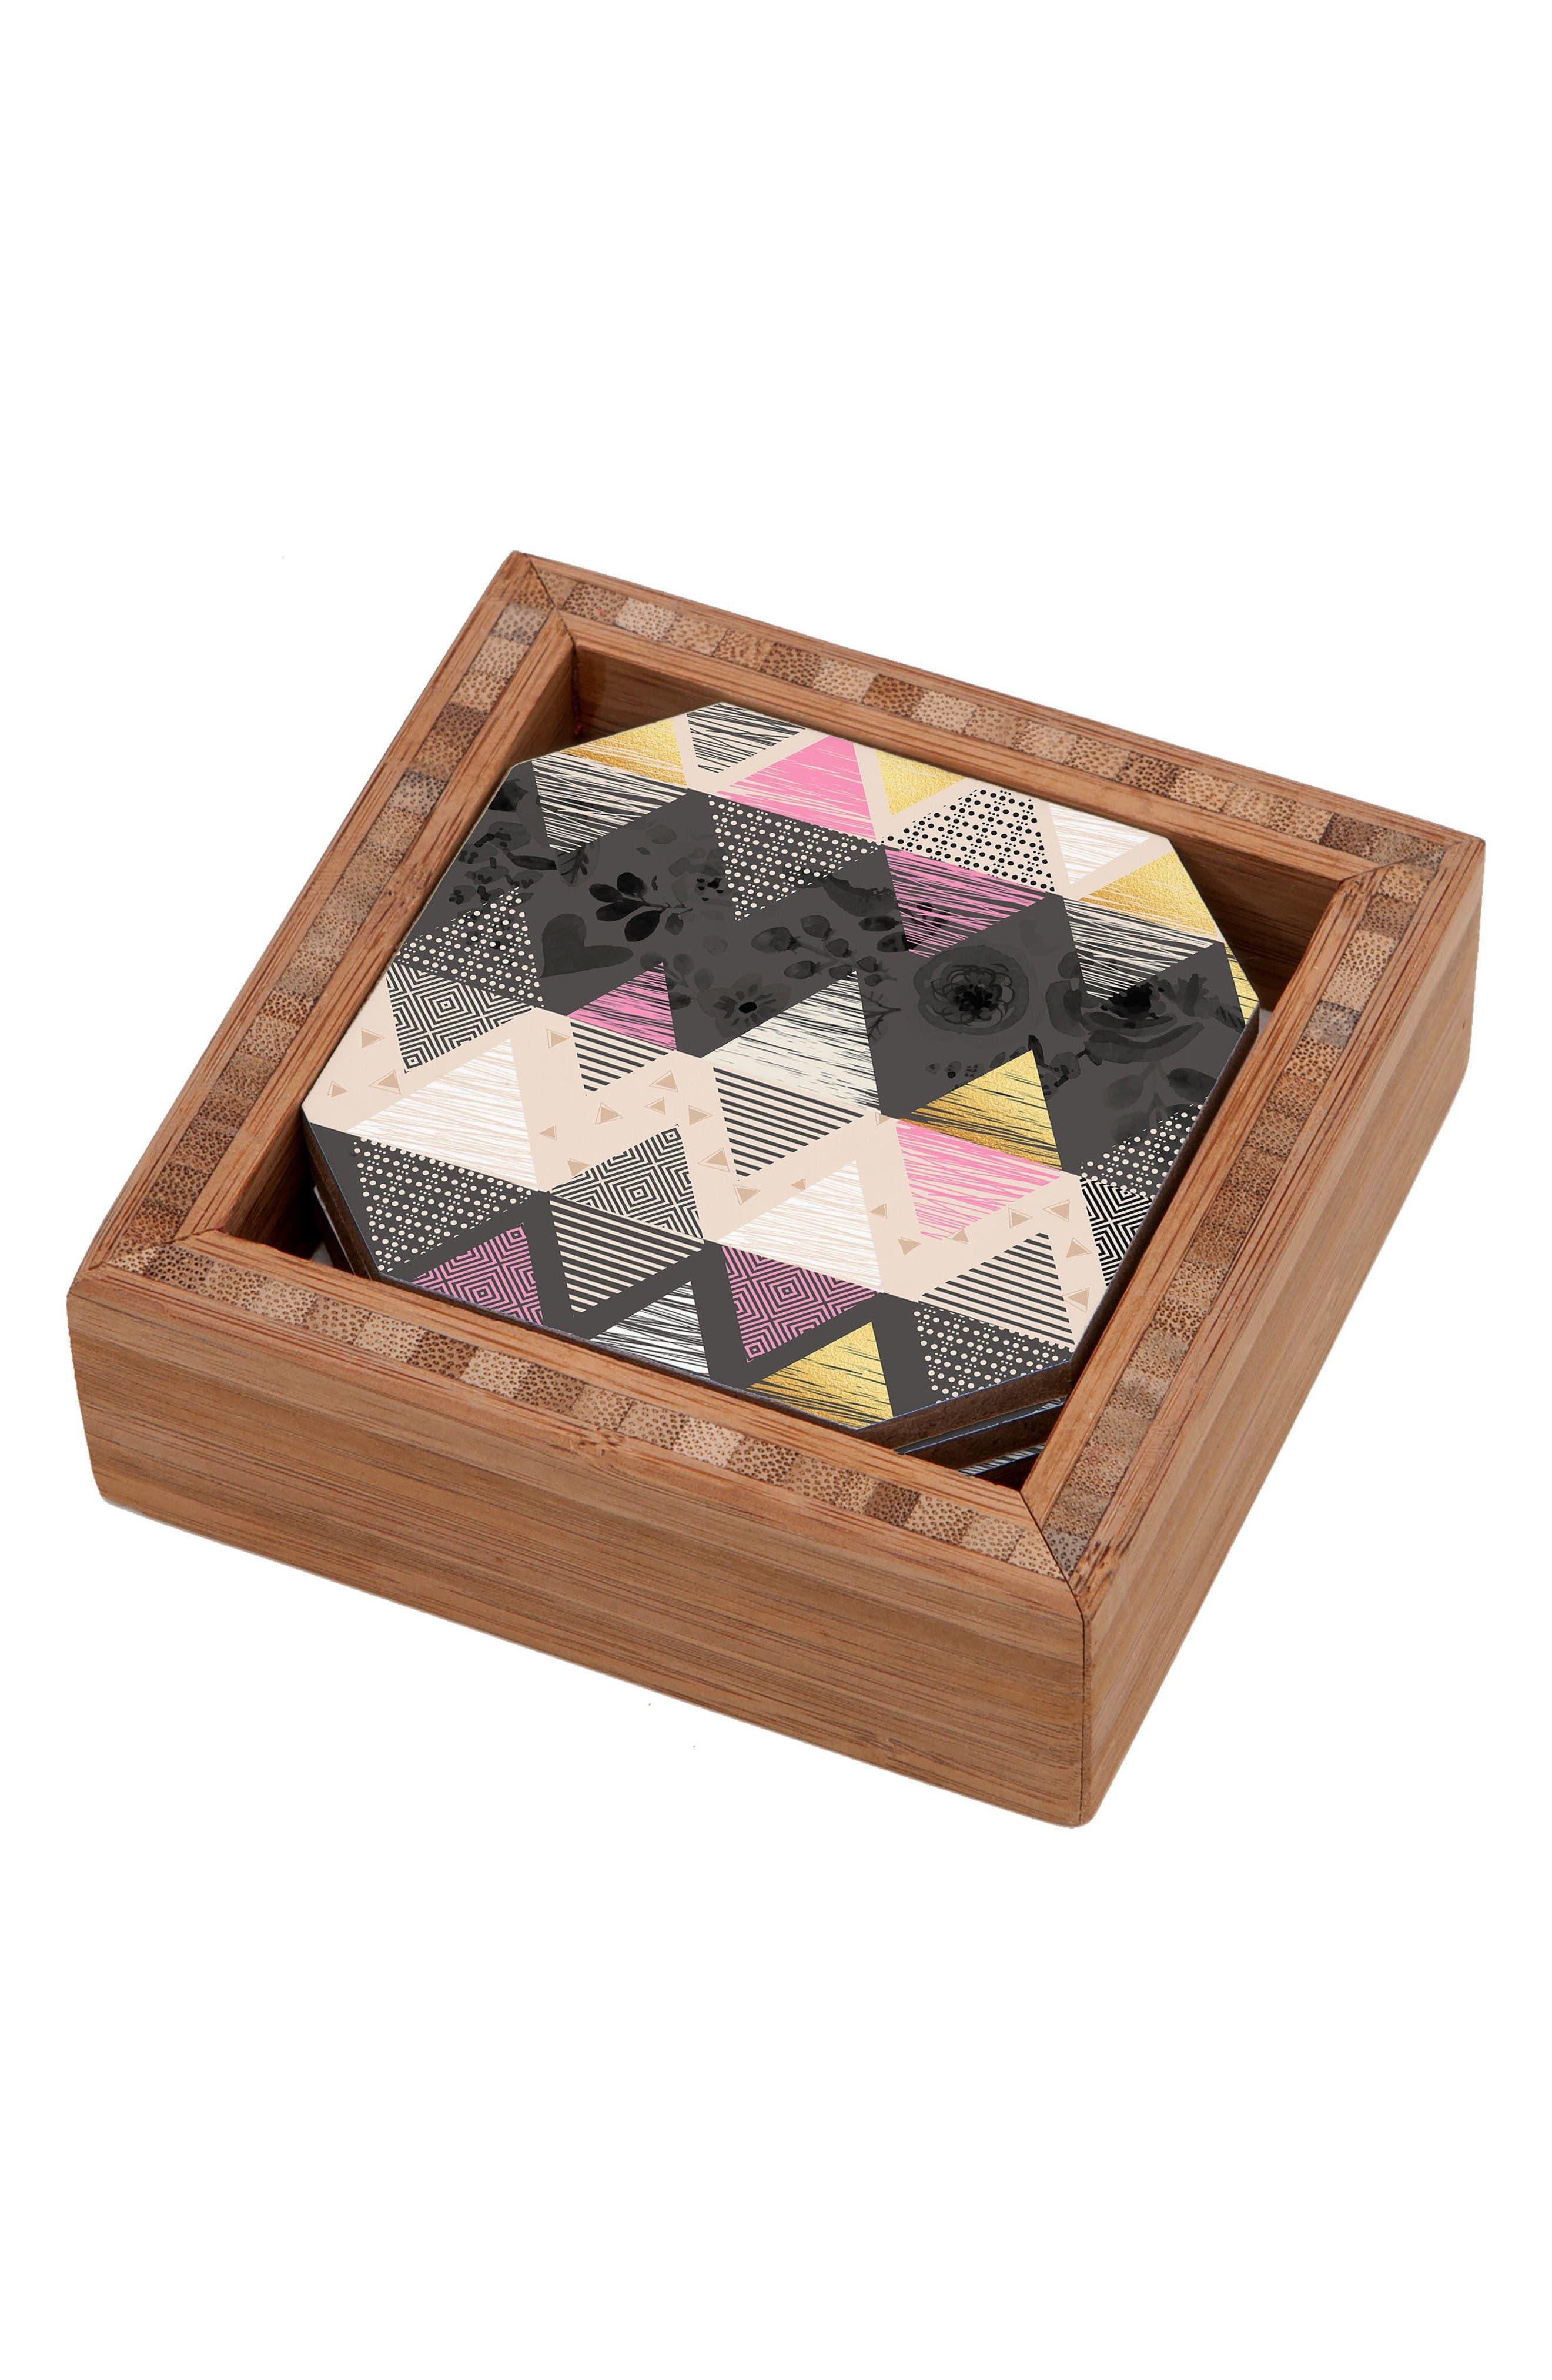 Alternate Image 1 Selected - Deny Designs Geometric Set of 4 Coasters